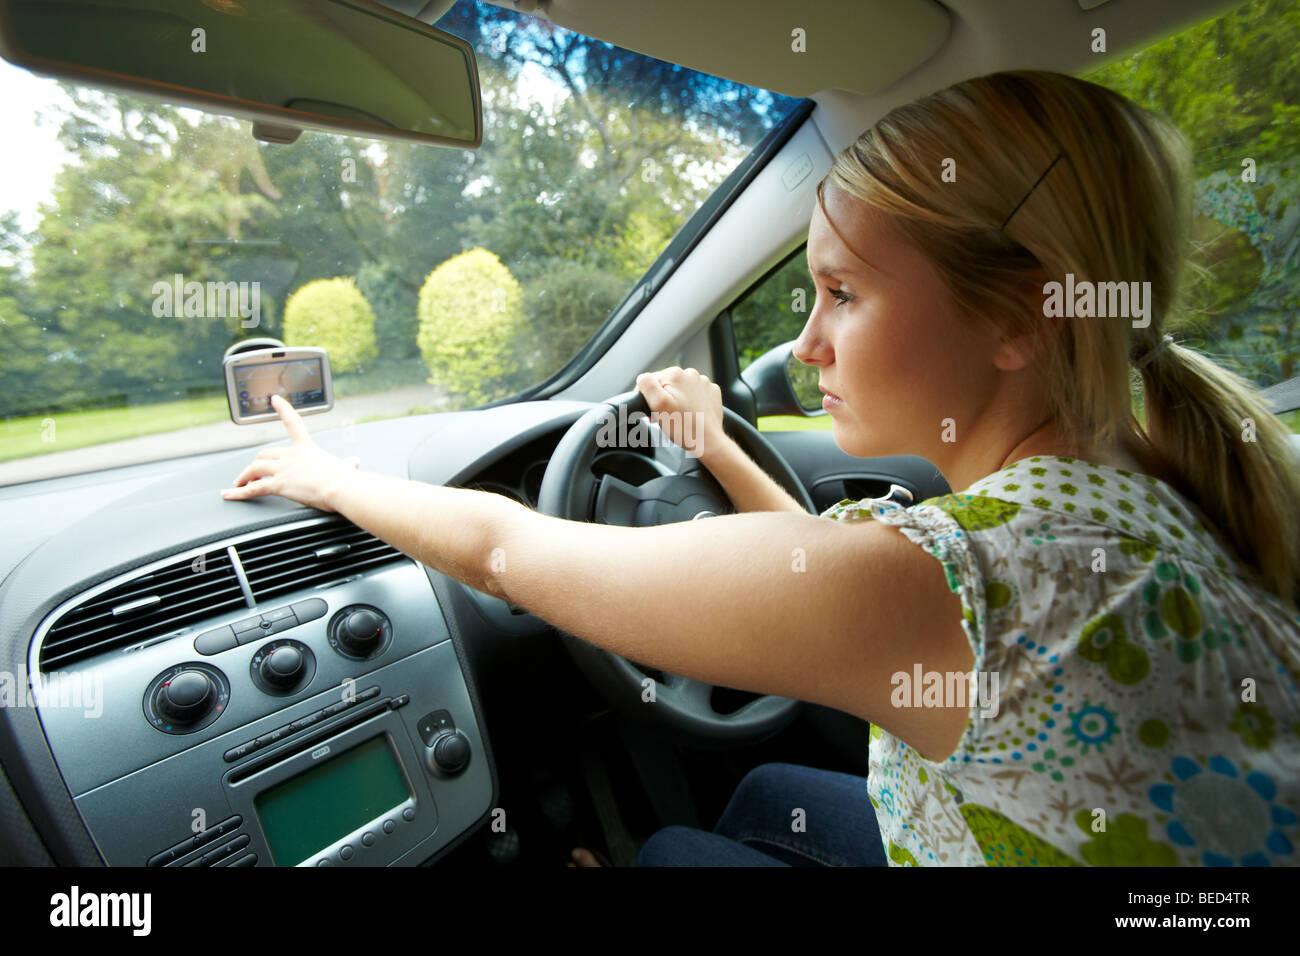 Girl driving car using phone - Stock Image